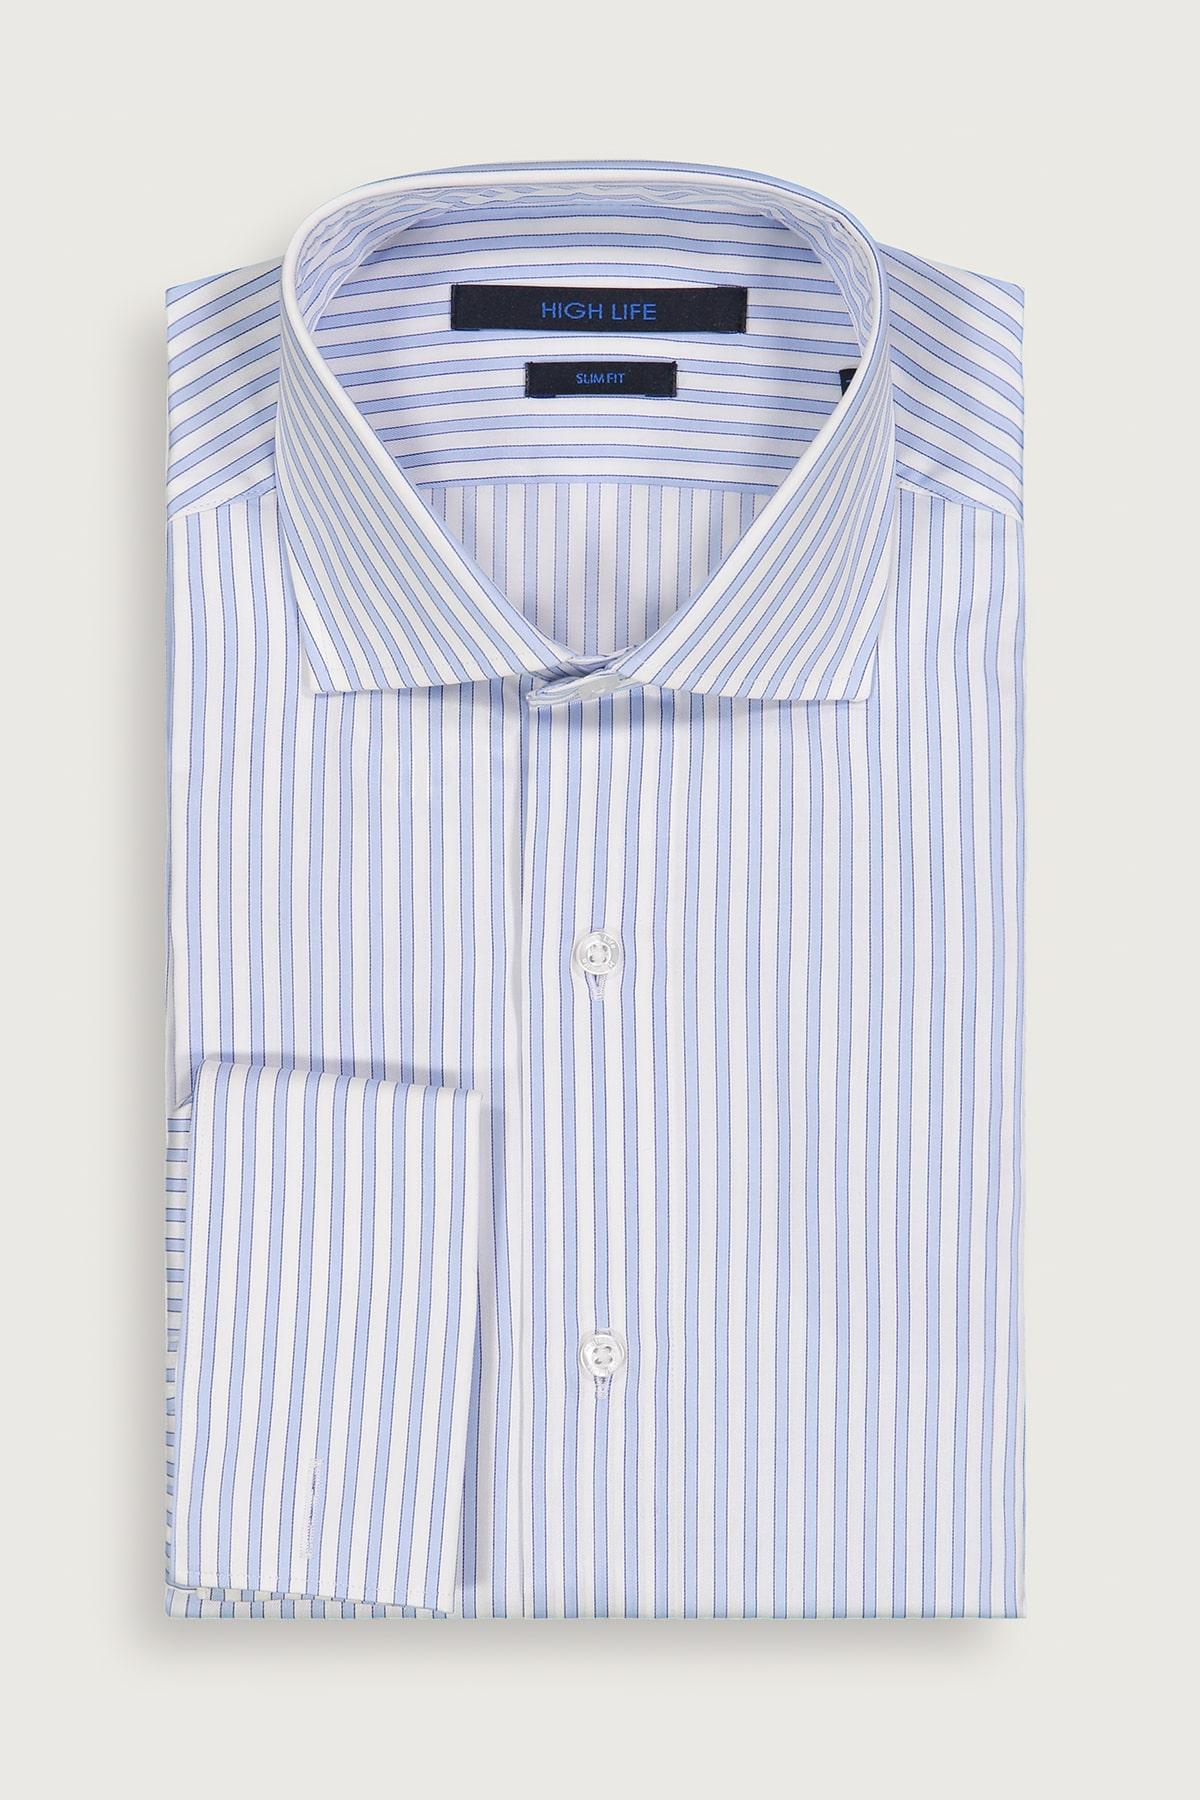 Camisa Vestir HIGH LIFE corte Slim, tejido azul con rayas a contraste tejido 100% algodón